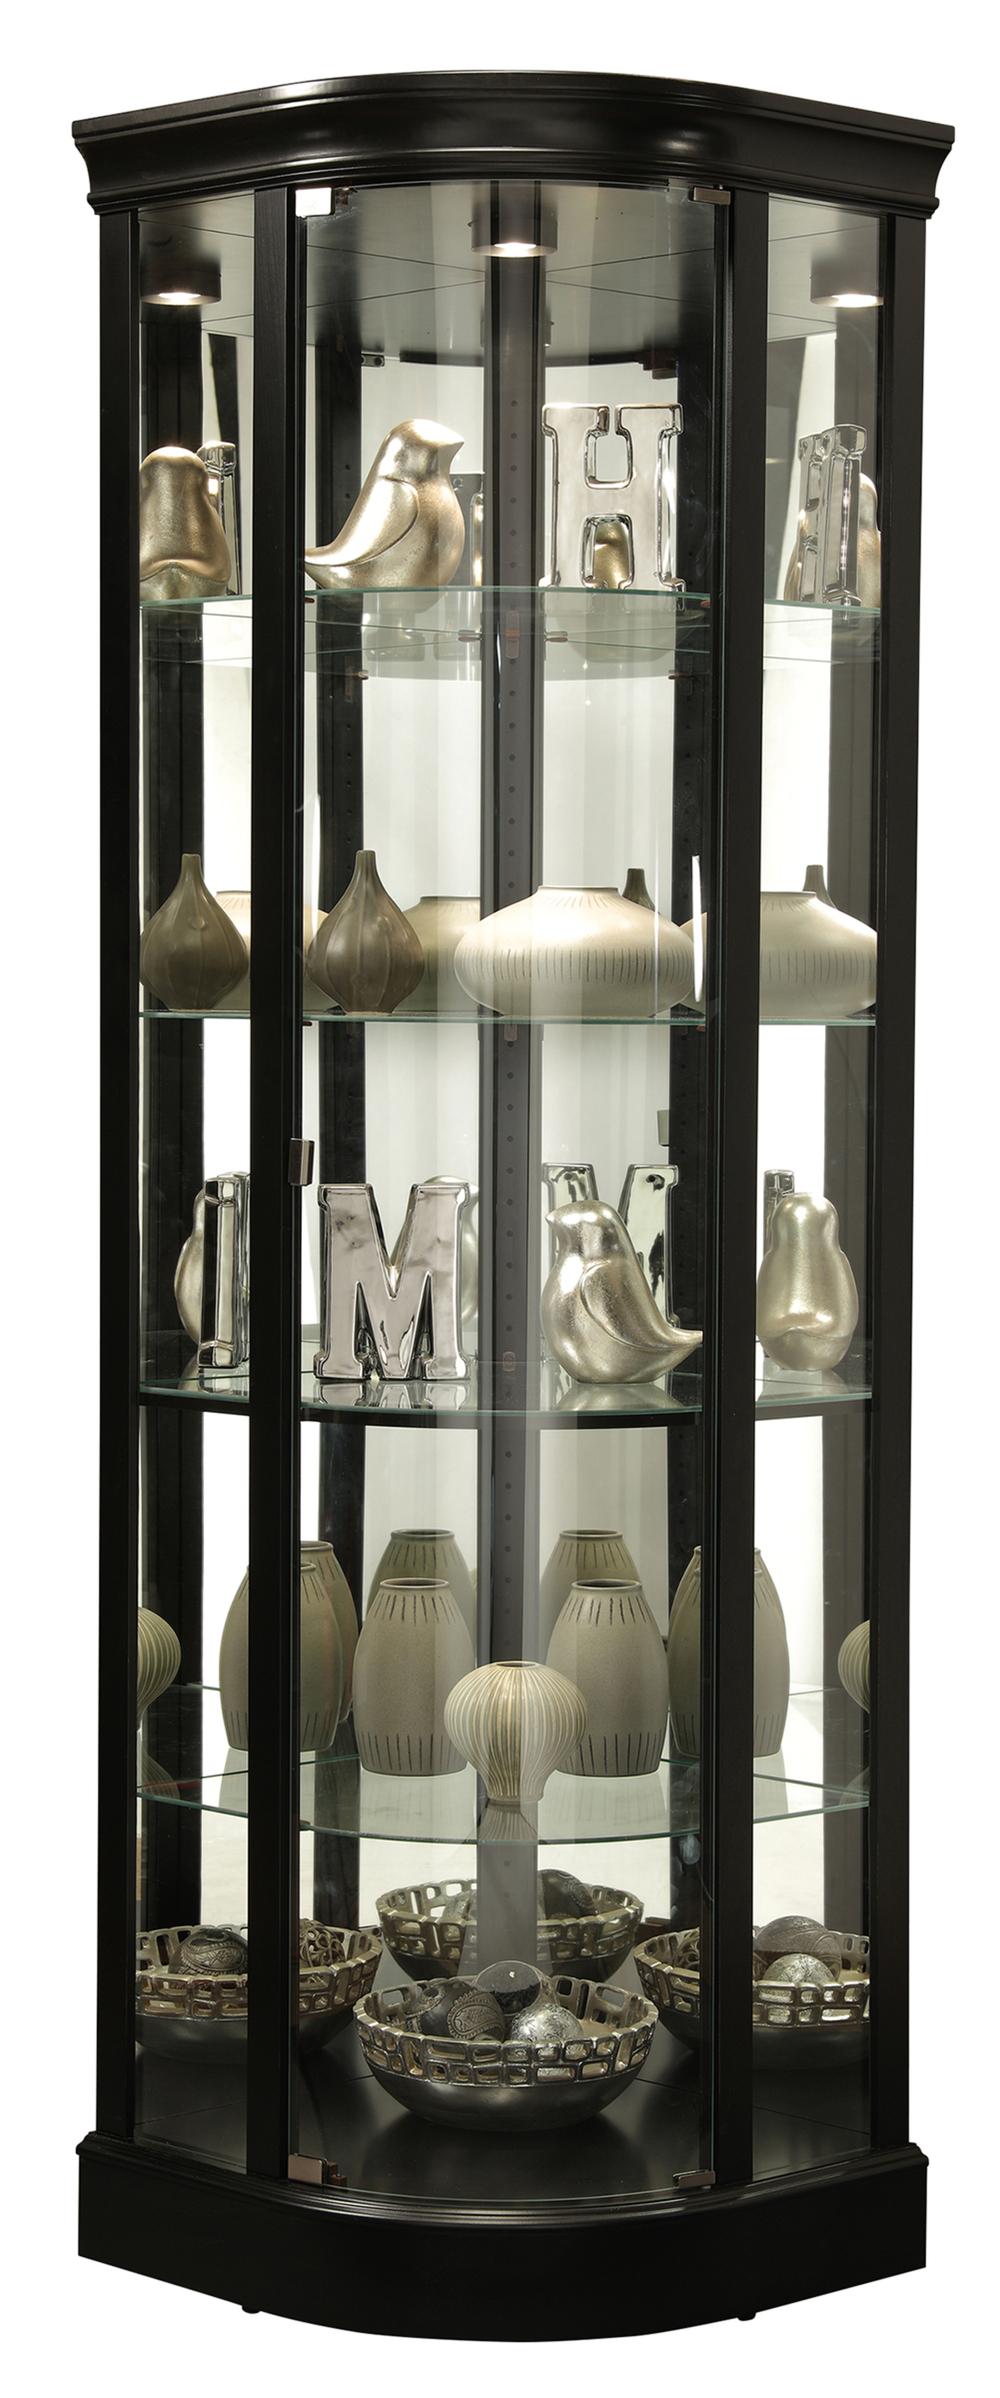 Howard Miller Clock - Marlowe II Curio Cabinet